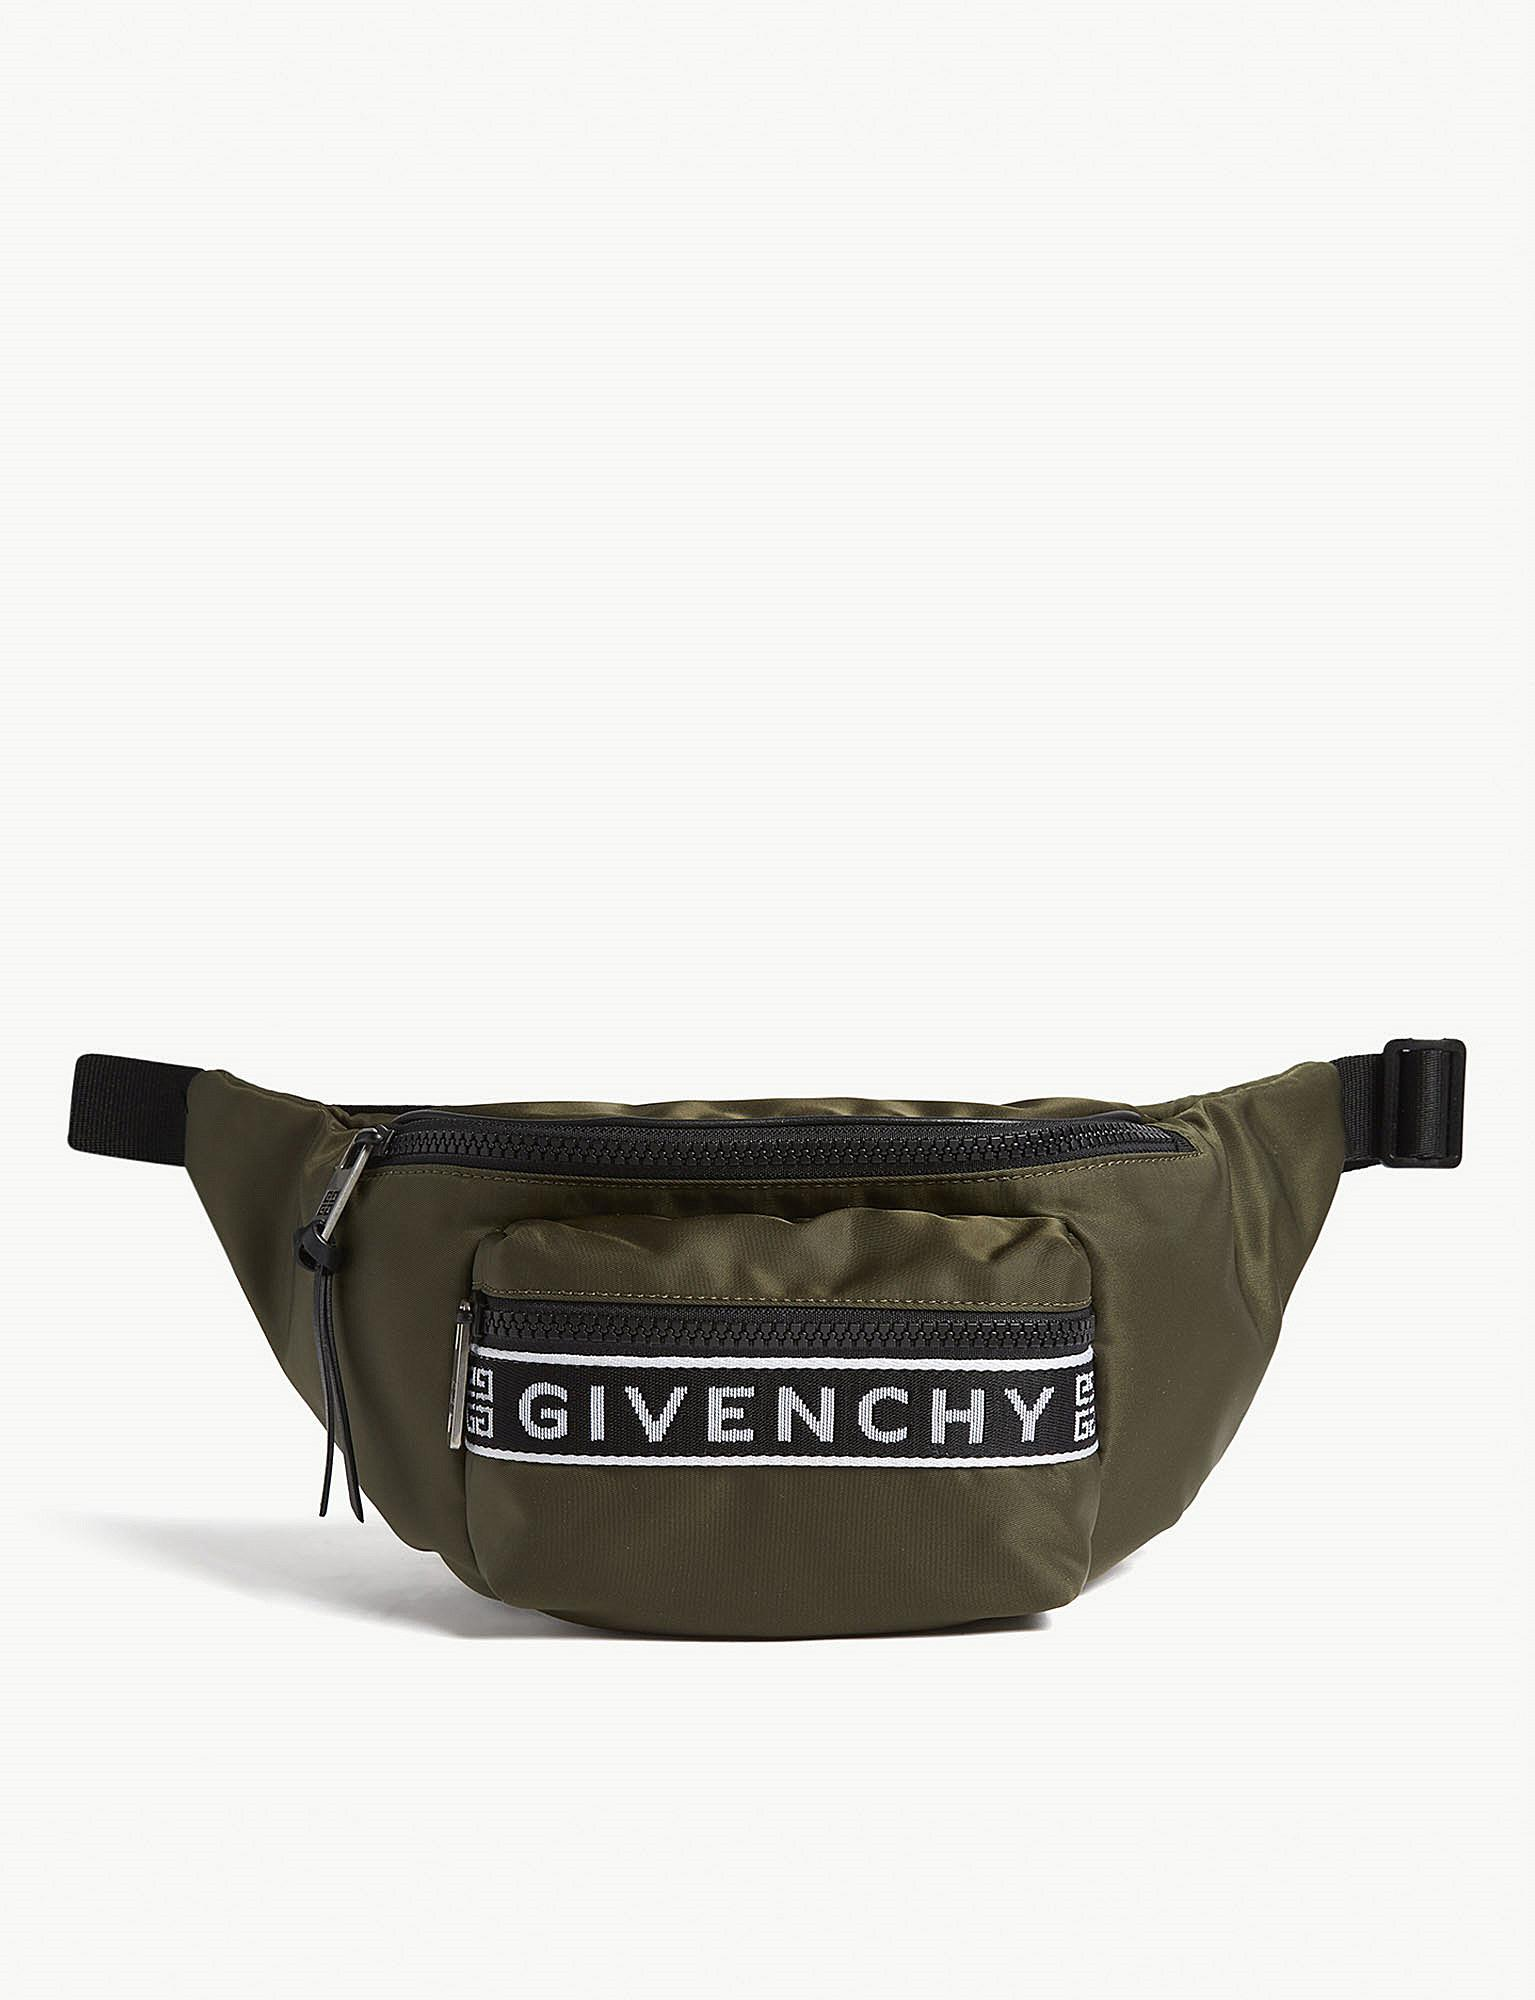 36cd17a067 Lyst - Givenchy Light3 Nylon Belt Bag in Black for Men